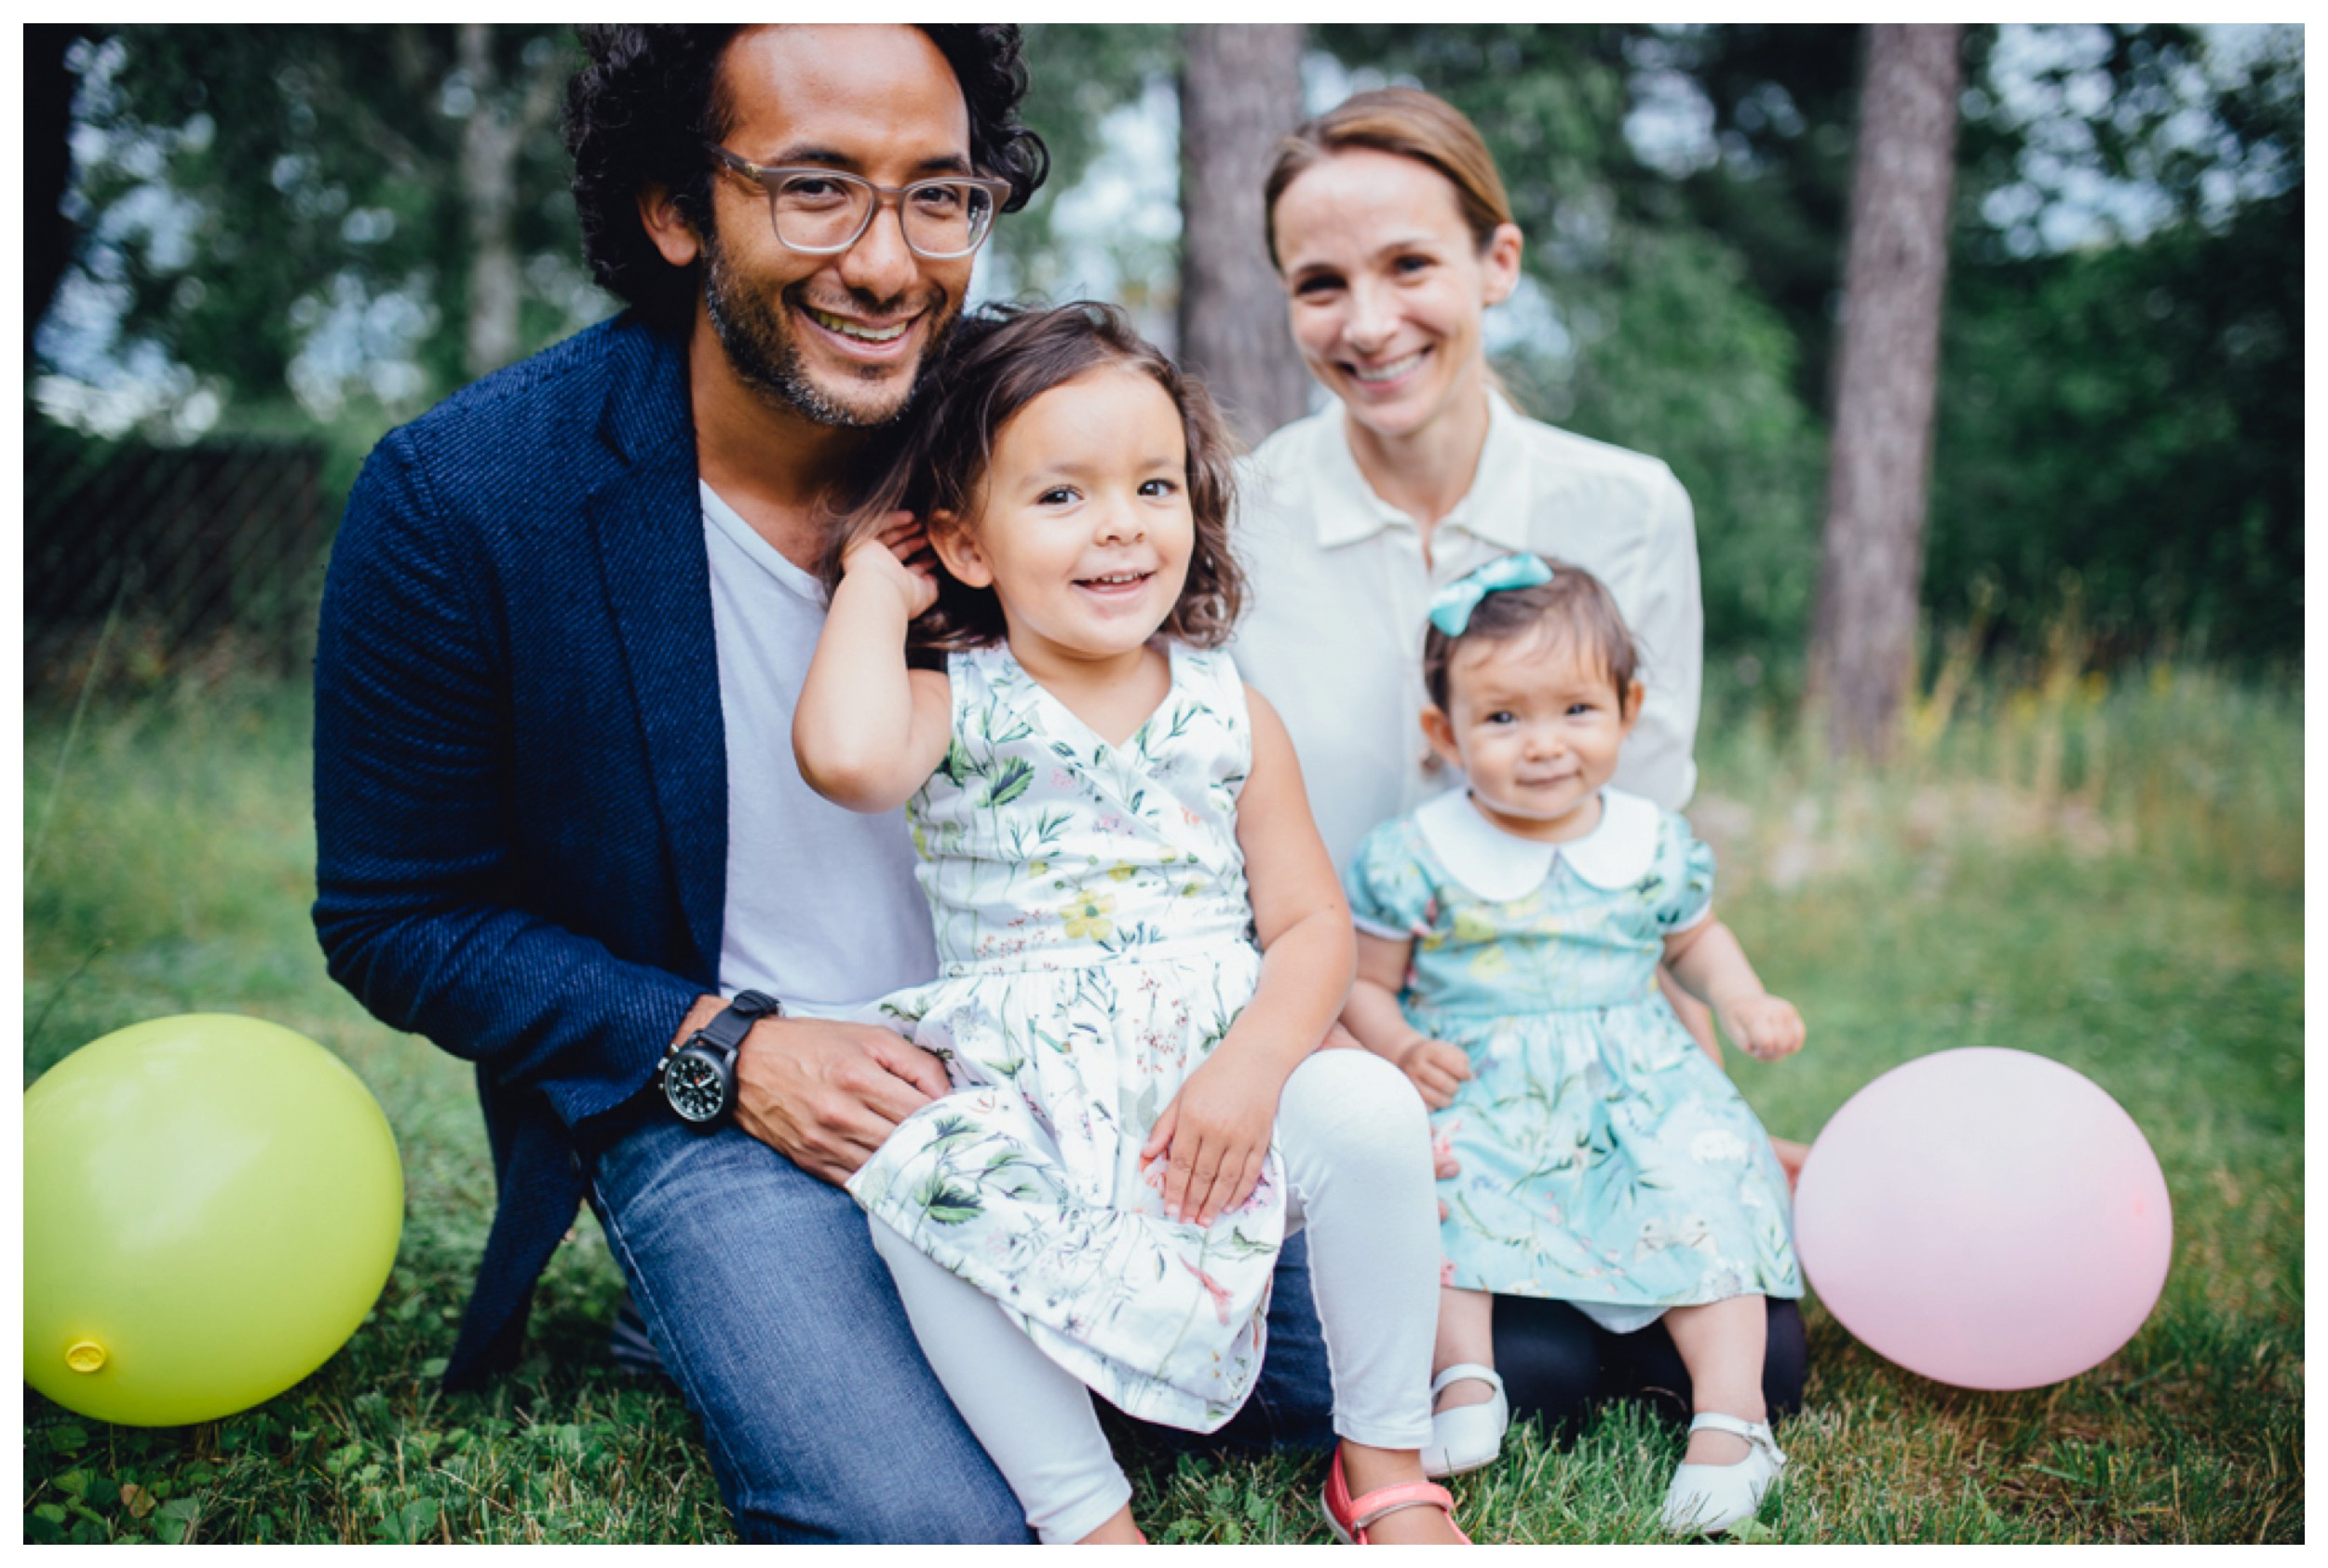 familjefotograf_stockholm_familjefotografering_linda rehlinfamiljefotograf_stockholm_familjefotografering_linda rehlin